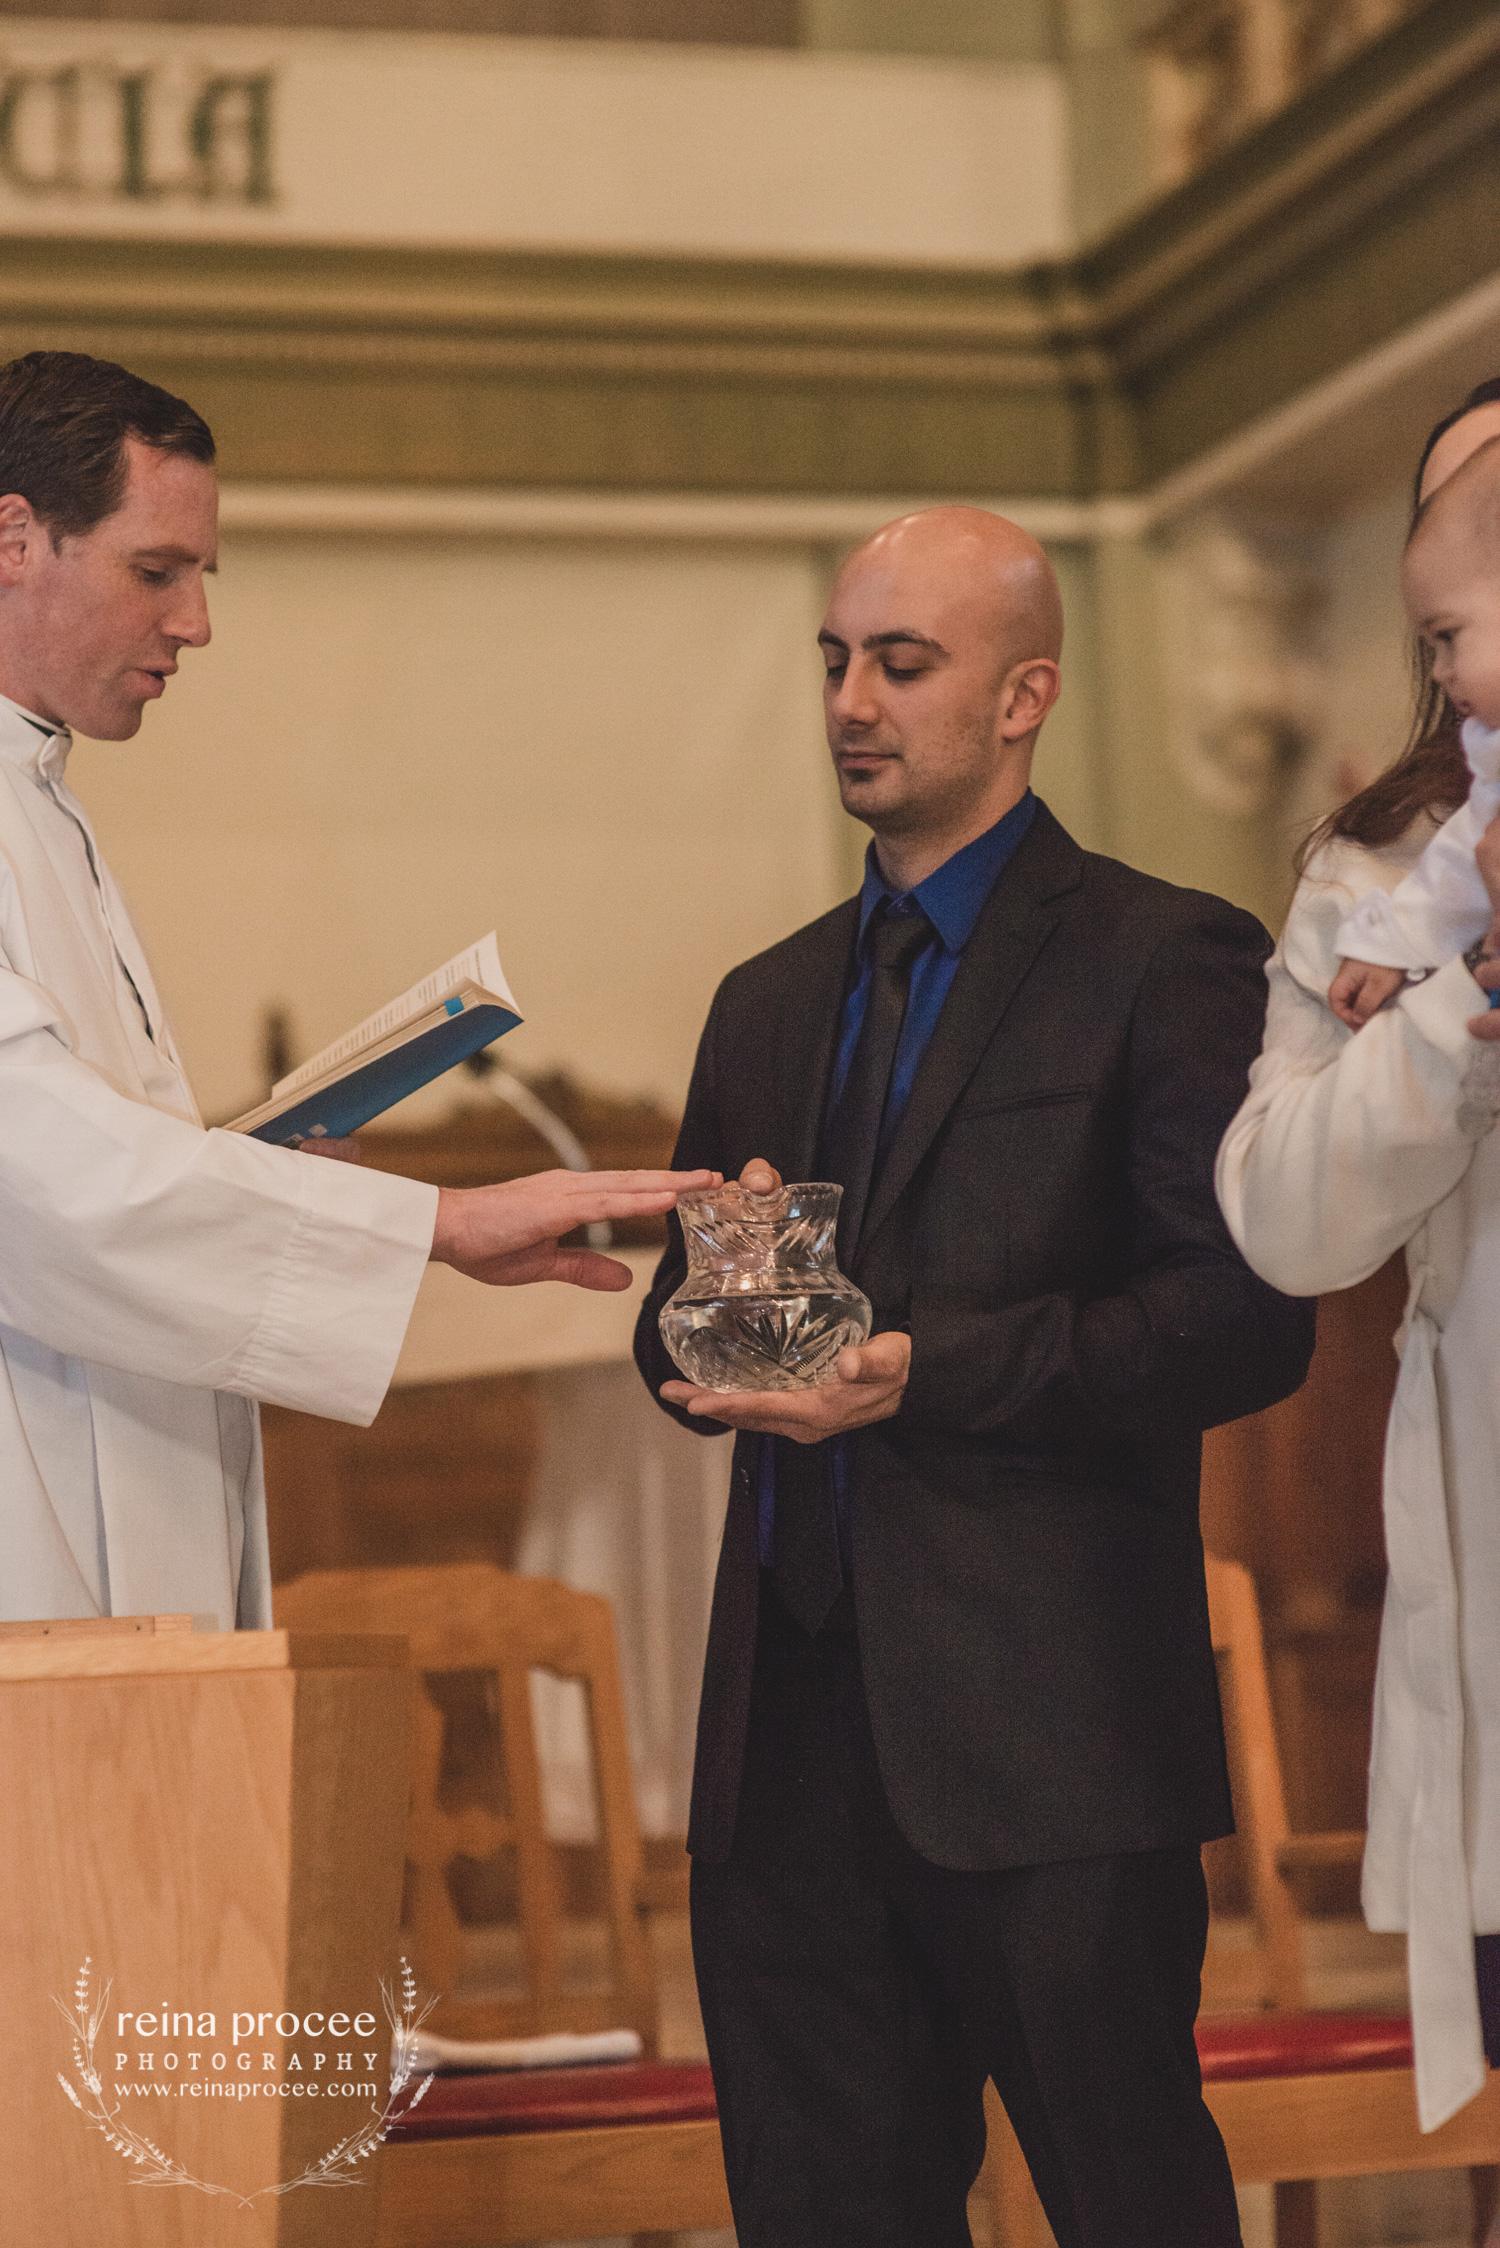 040-baptism-photographer-montreal-family-best-photos-portraits.jpg